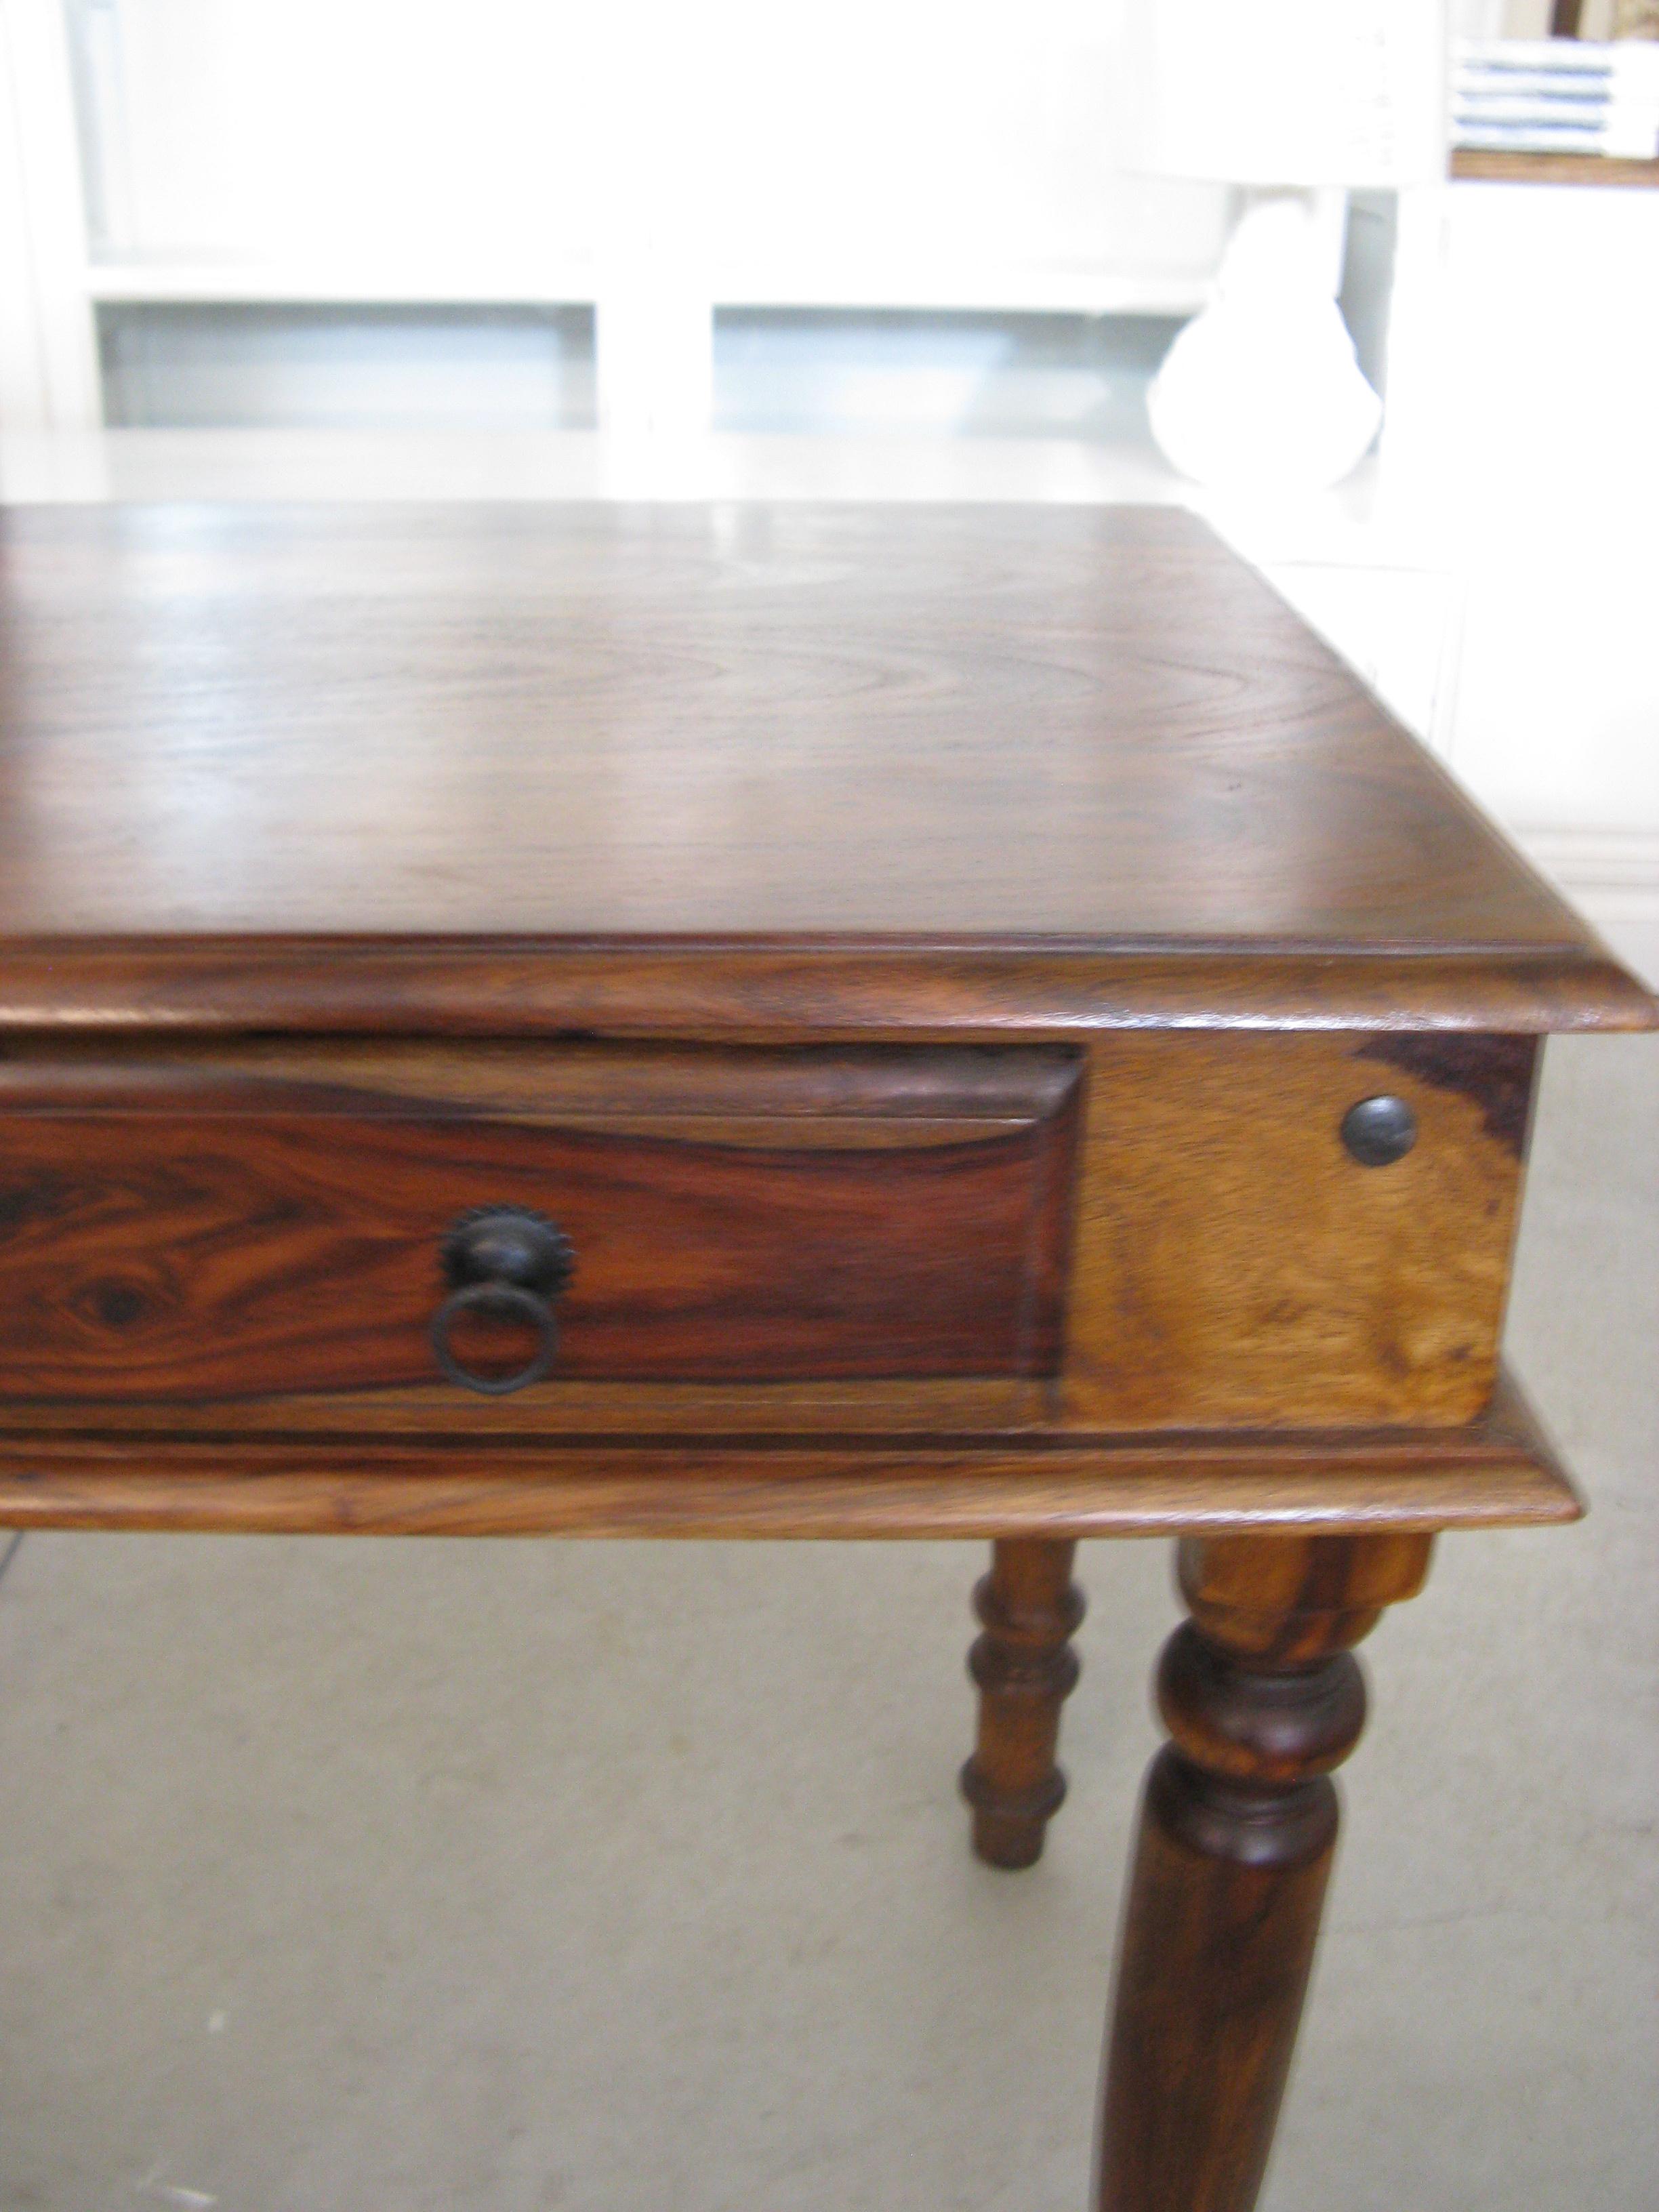 Tavoli di legno in palissandro indiano - Outlet ingrosso mobili ...